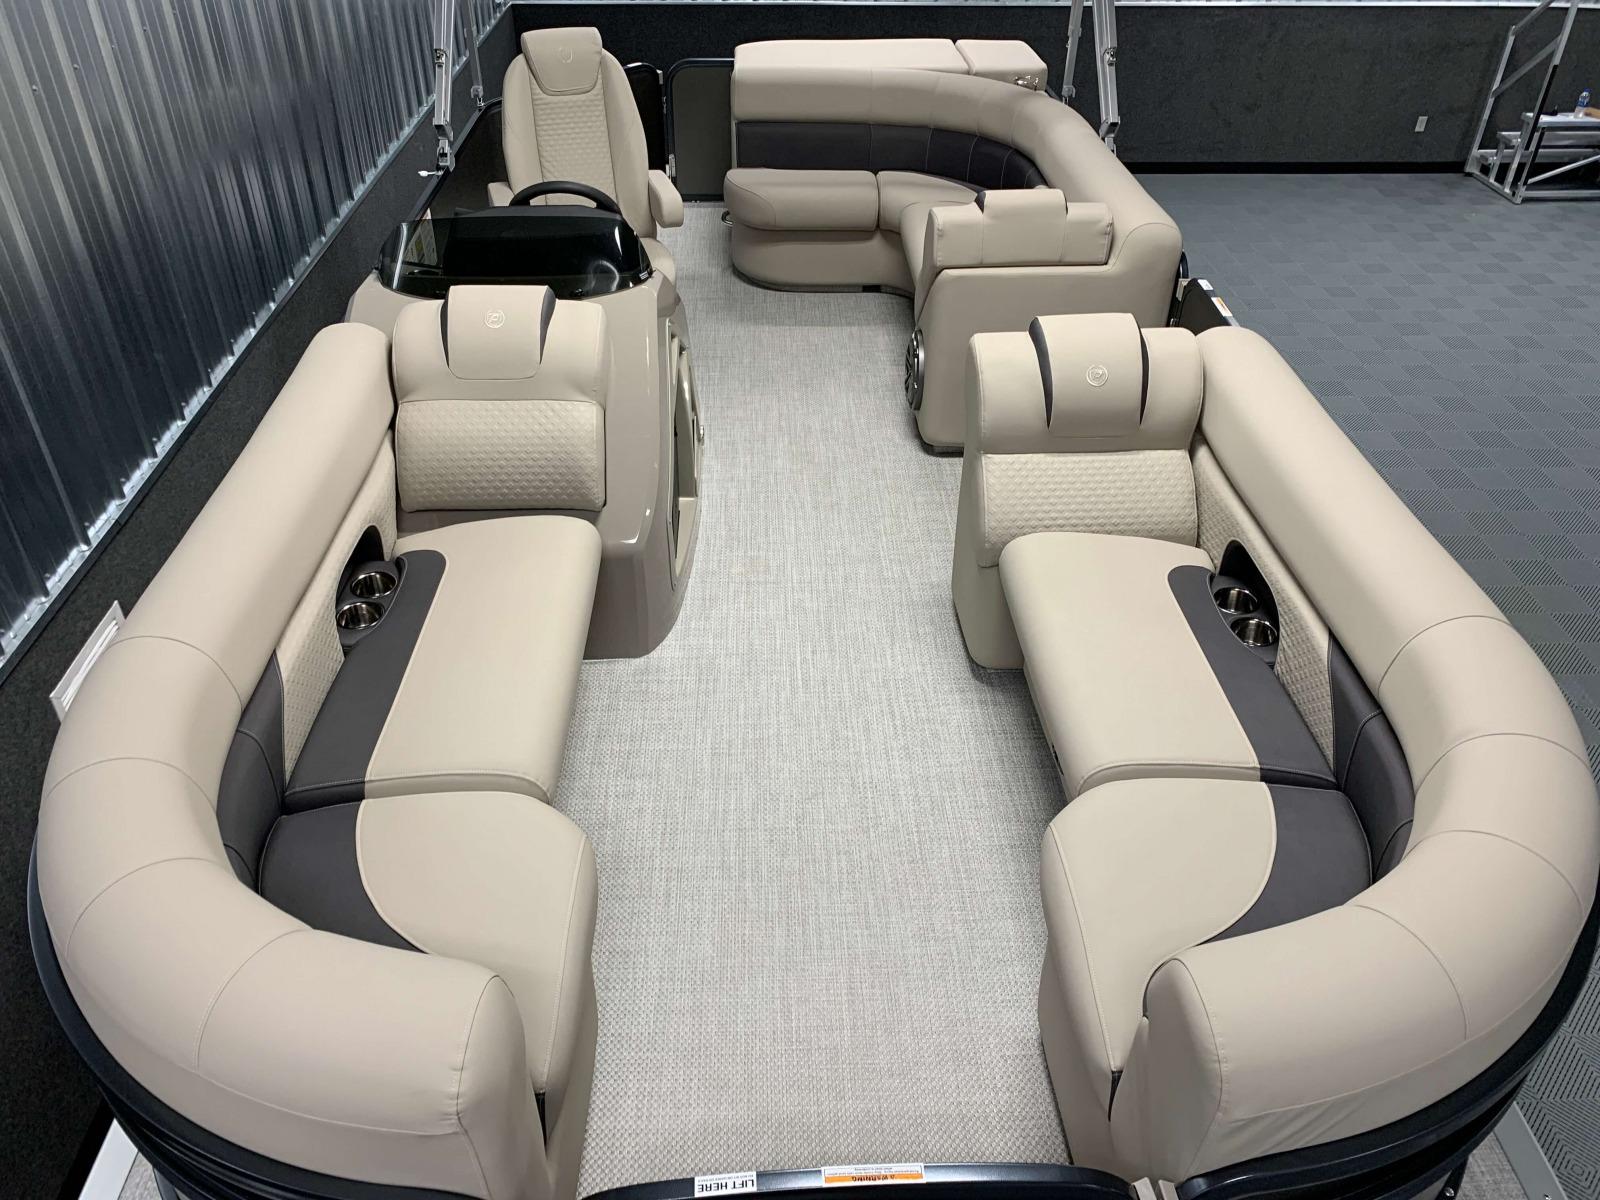 2020-Premier-Sunsation-RE-200-CL-Pontoon-Boat-Interior-Layout-1